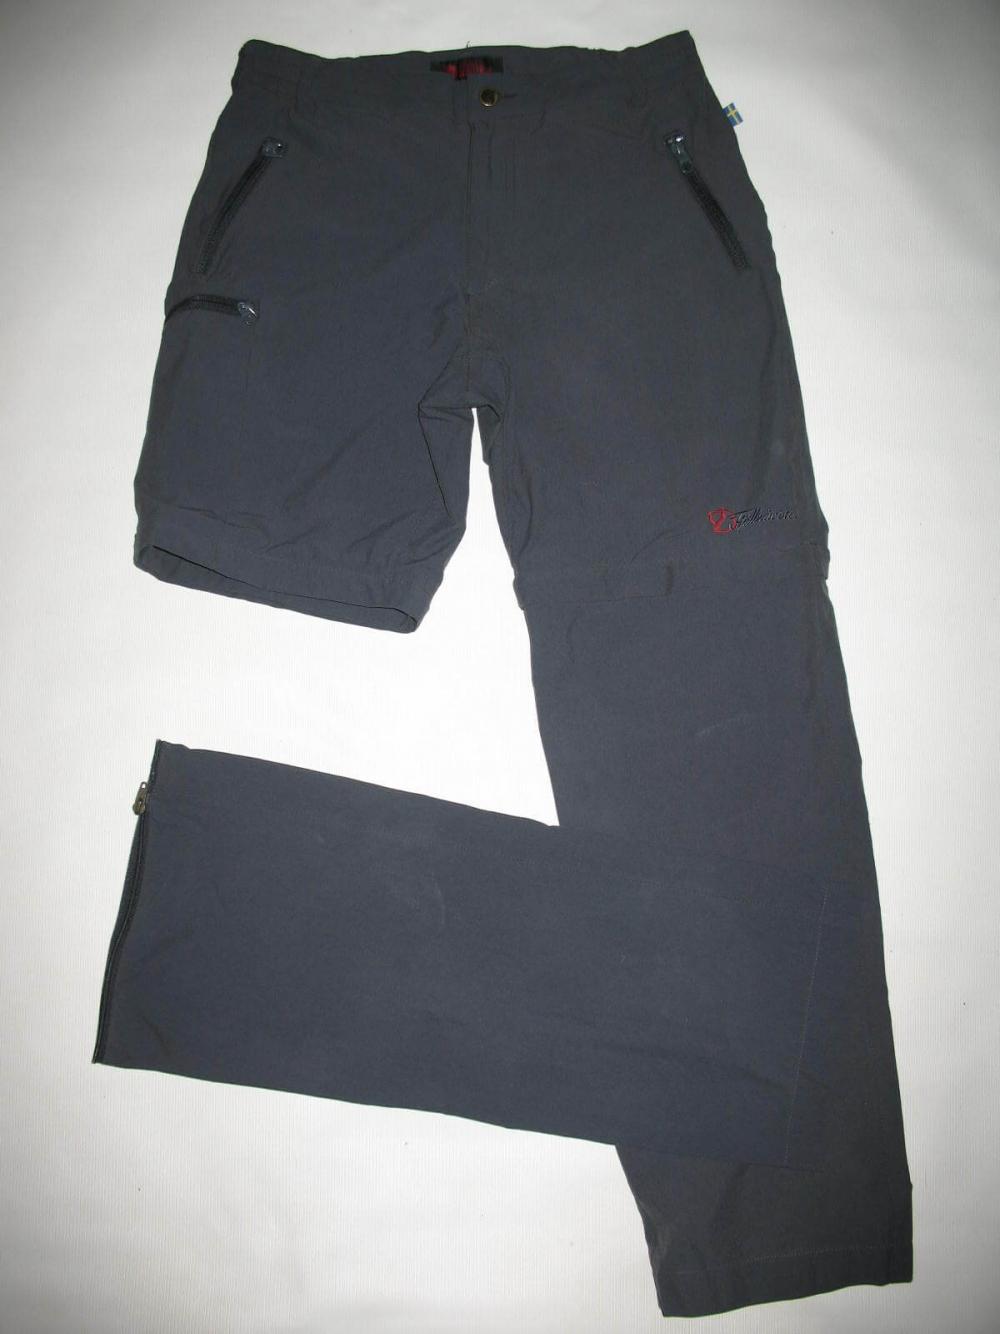 Штаны FJALLRAVEN 2in1 pants lady (размер 36/S) - 5